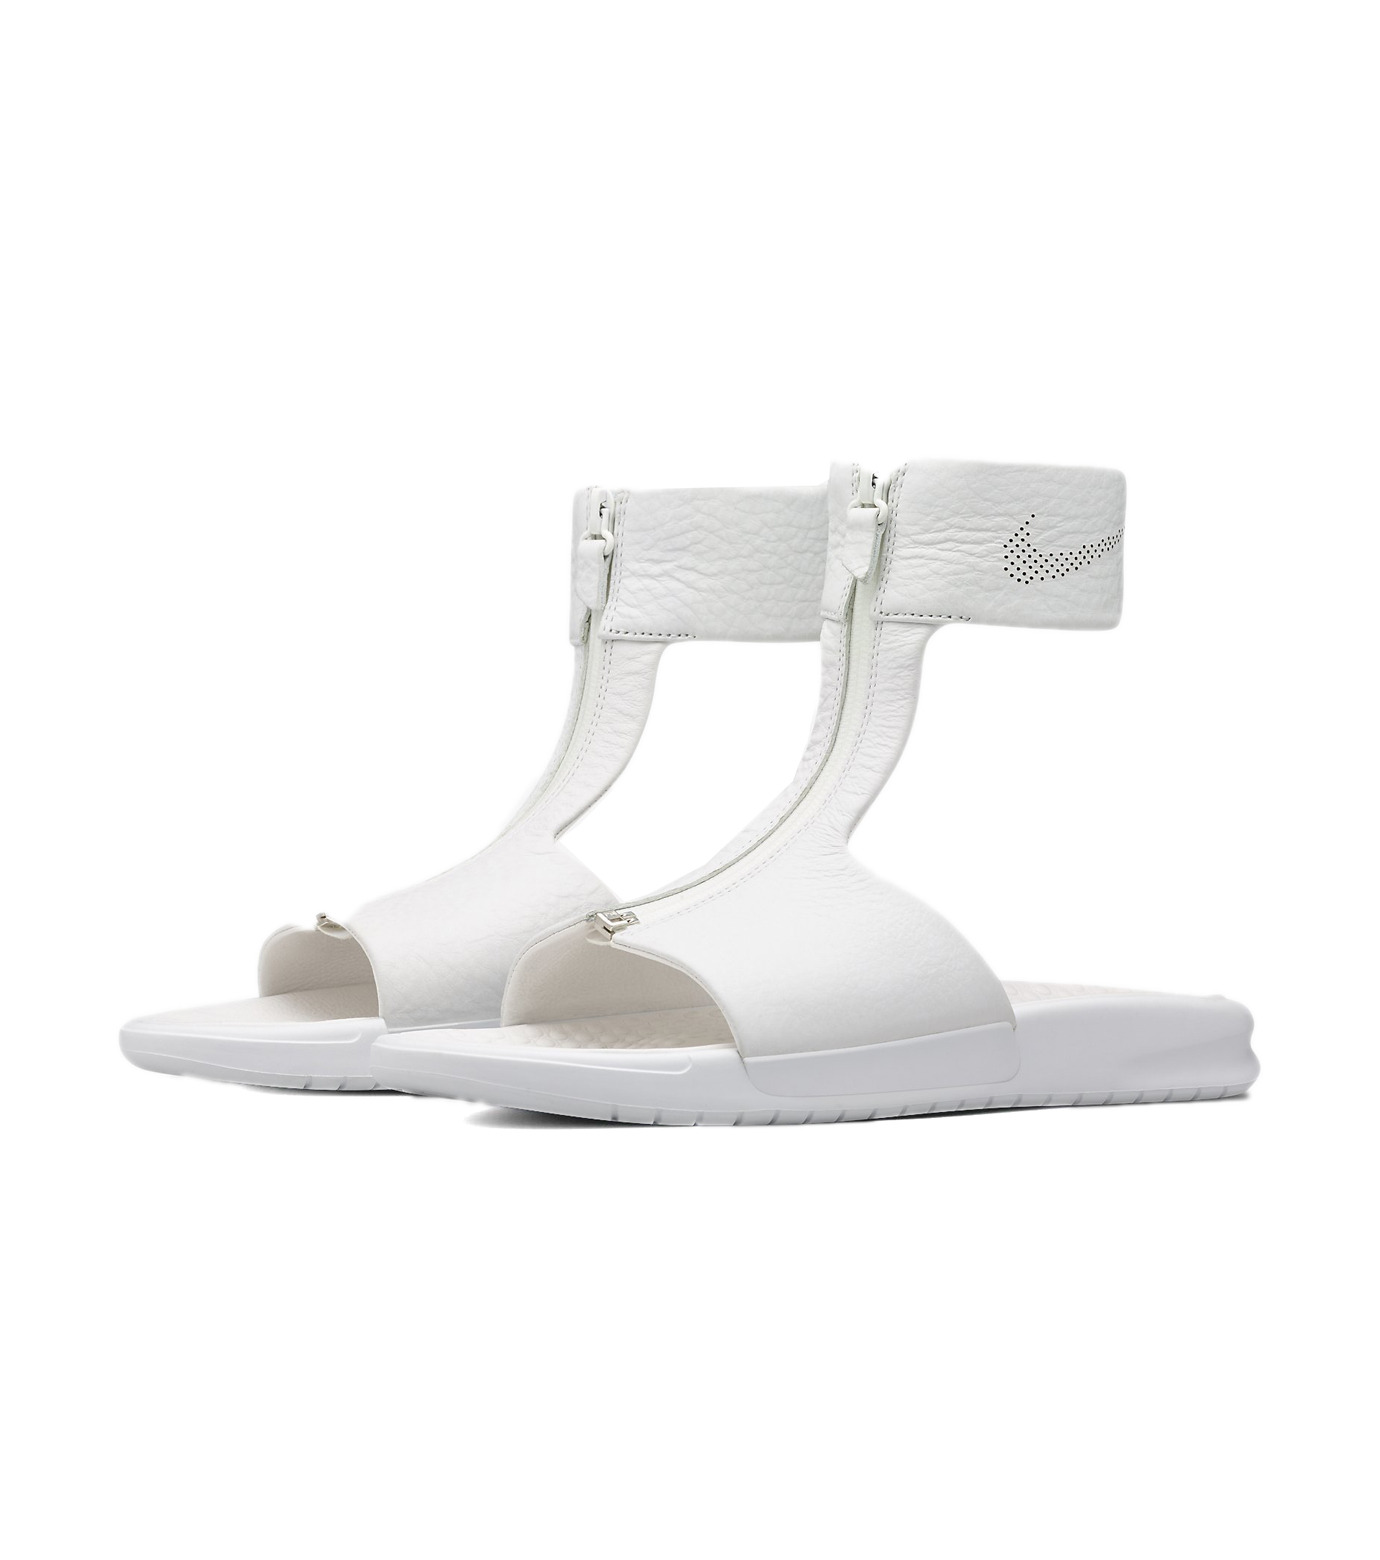 NIKE(ナイキ)のBenassi CUFF-WHITE(シューズ/shoes)-819684-100-4 拡大詳細画像3